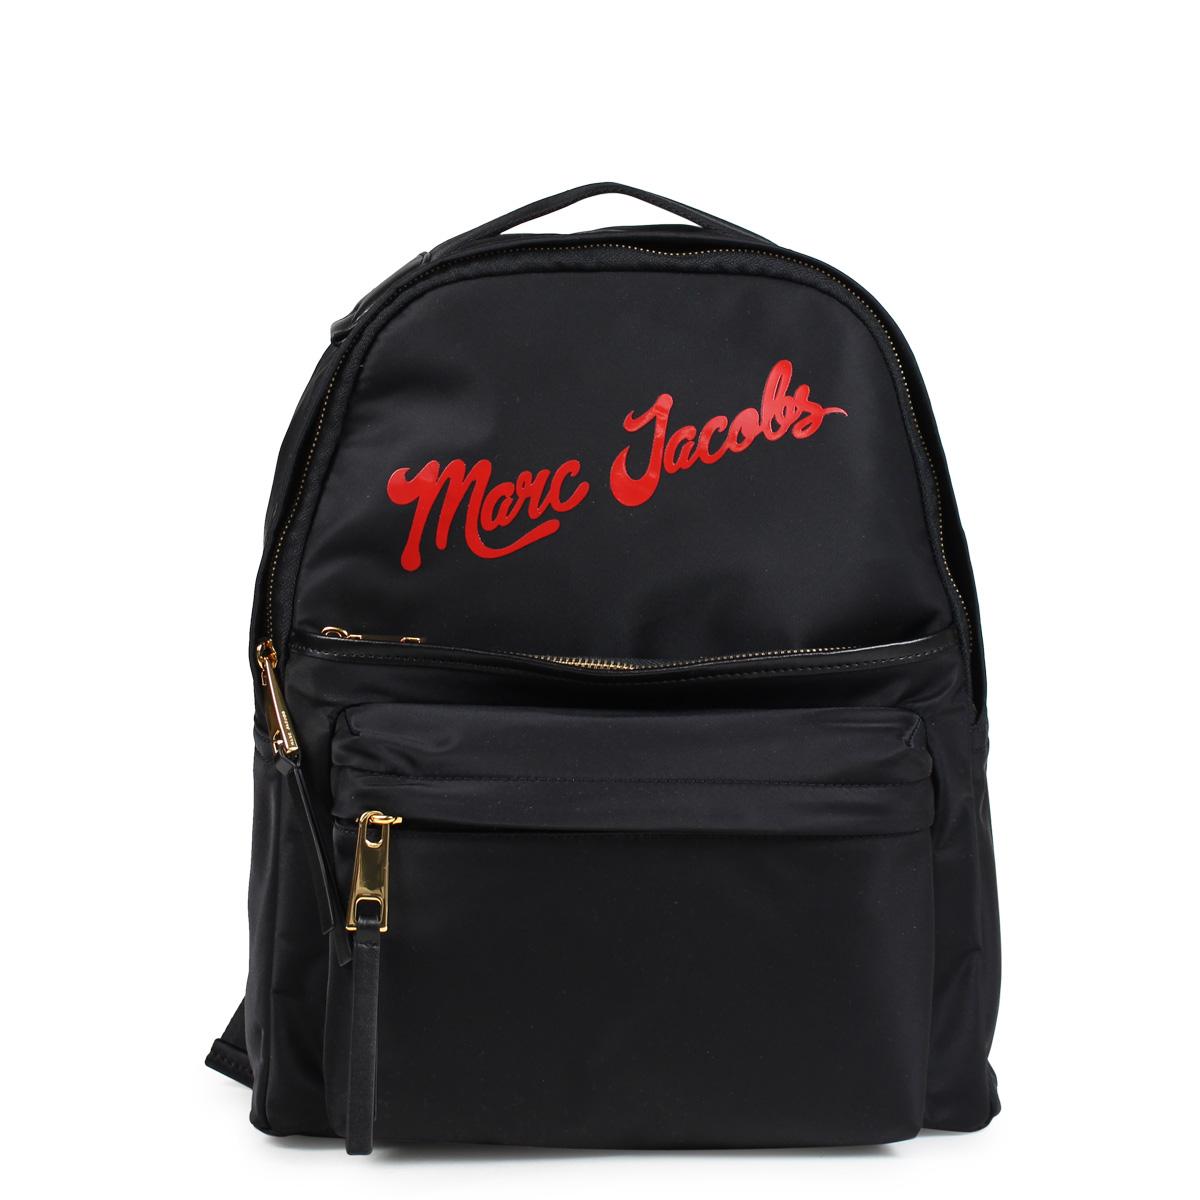 MARC JACOBS NYLON LARGE BACKPACK マークジェイコブス リュック バッグ バックパック レディース ブラック M0014161